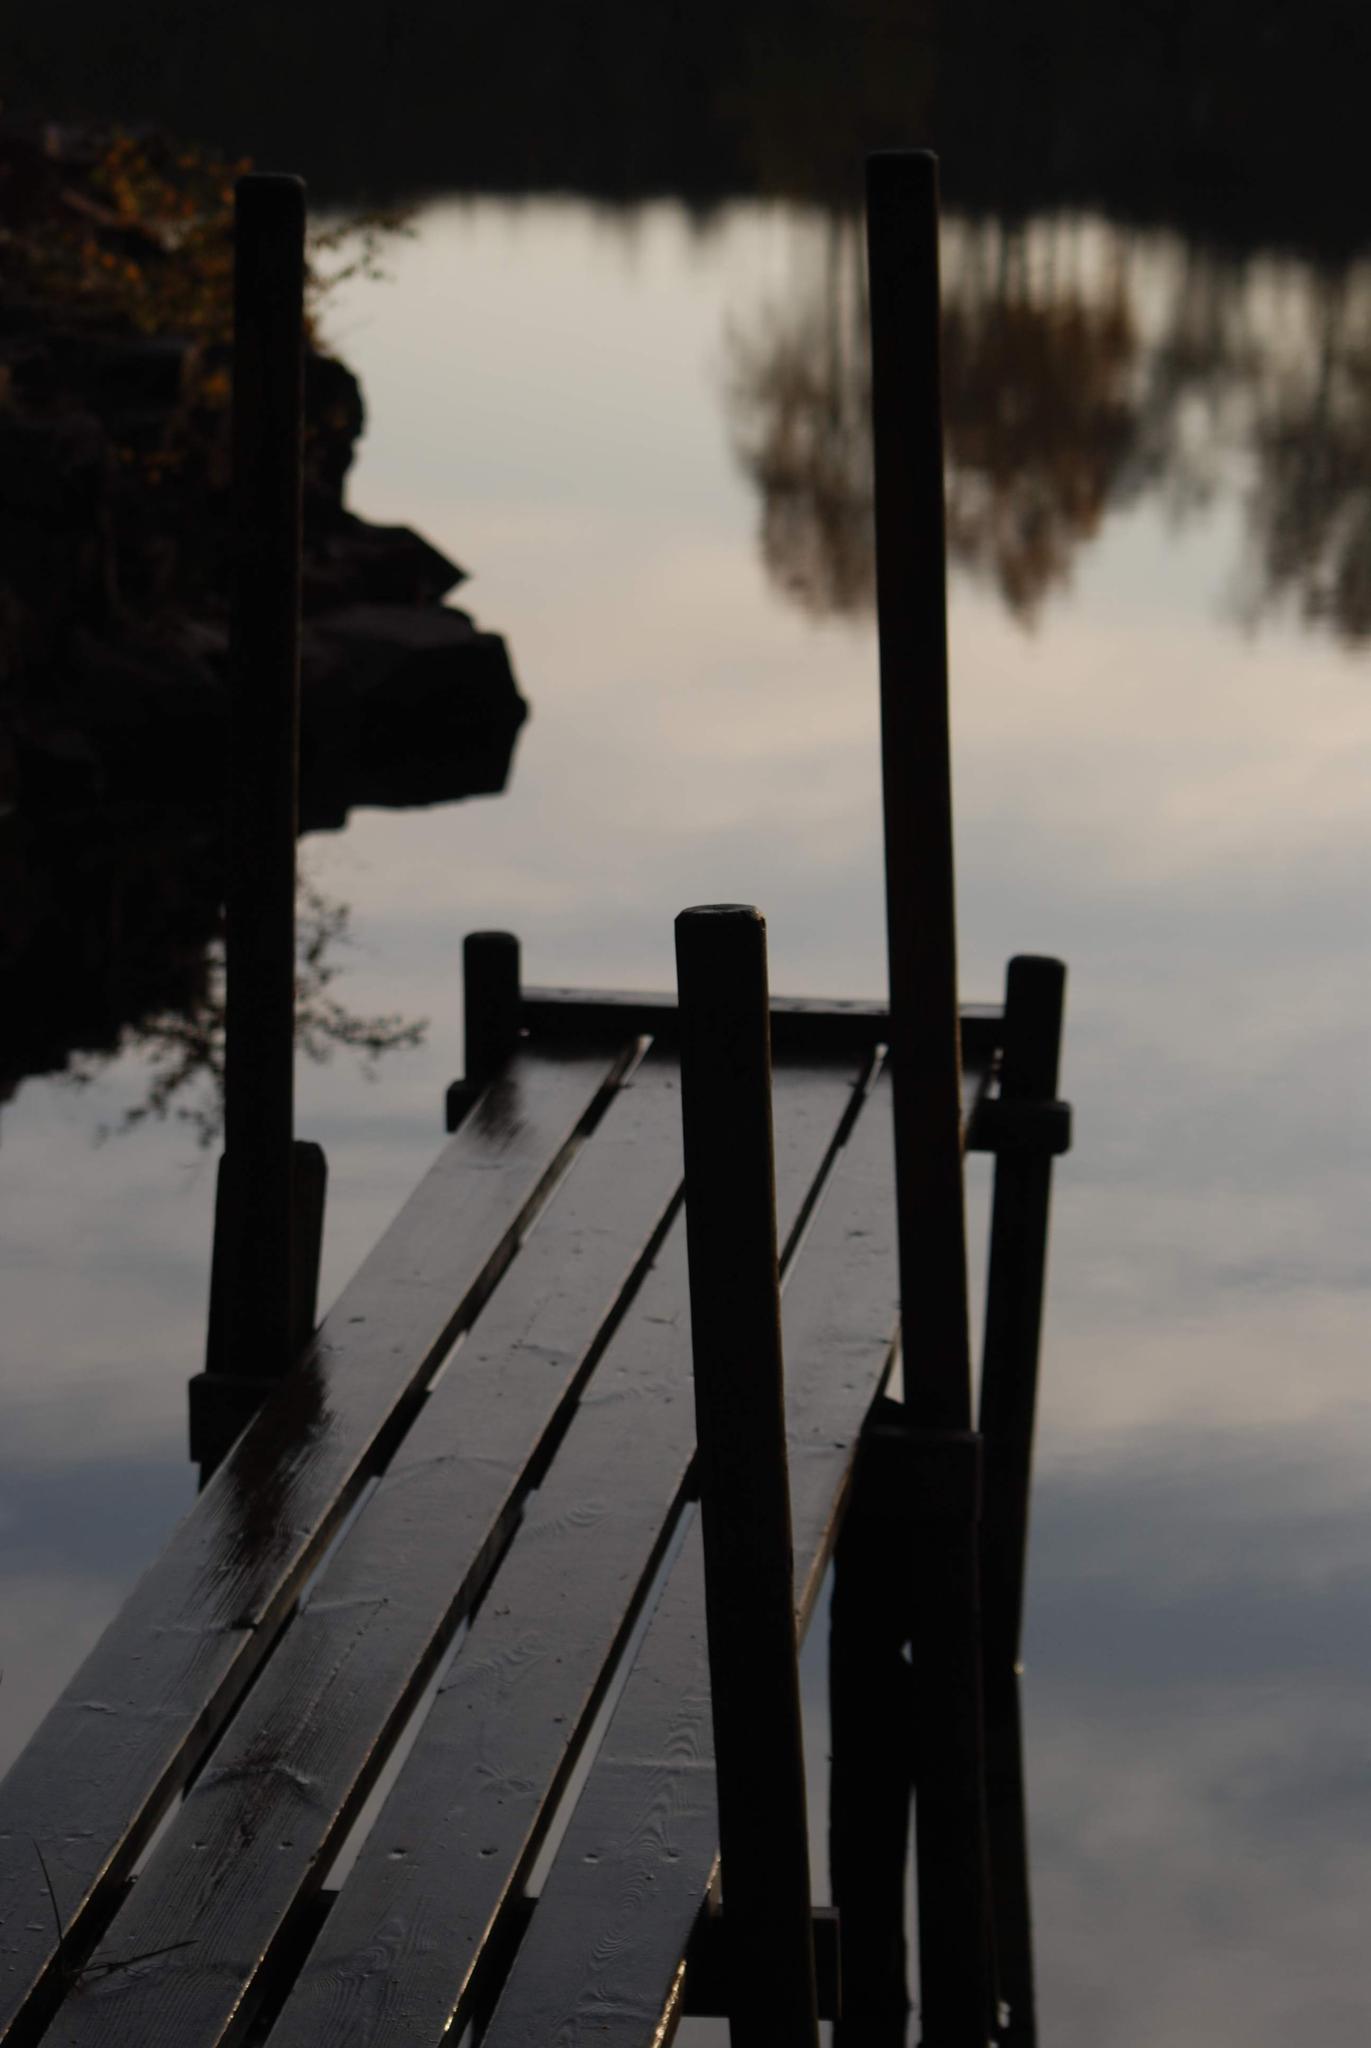 Bridge by hoffcecilia